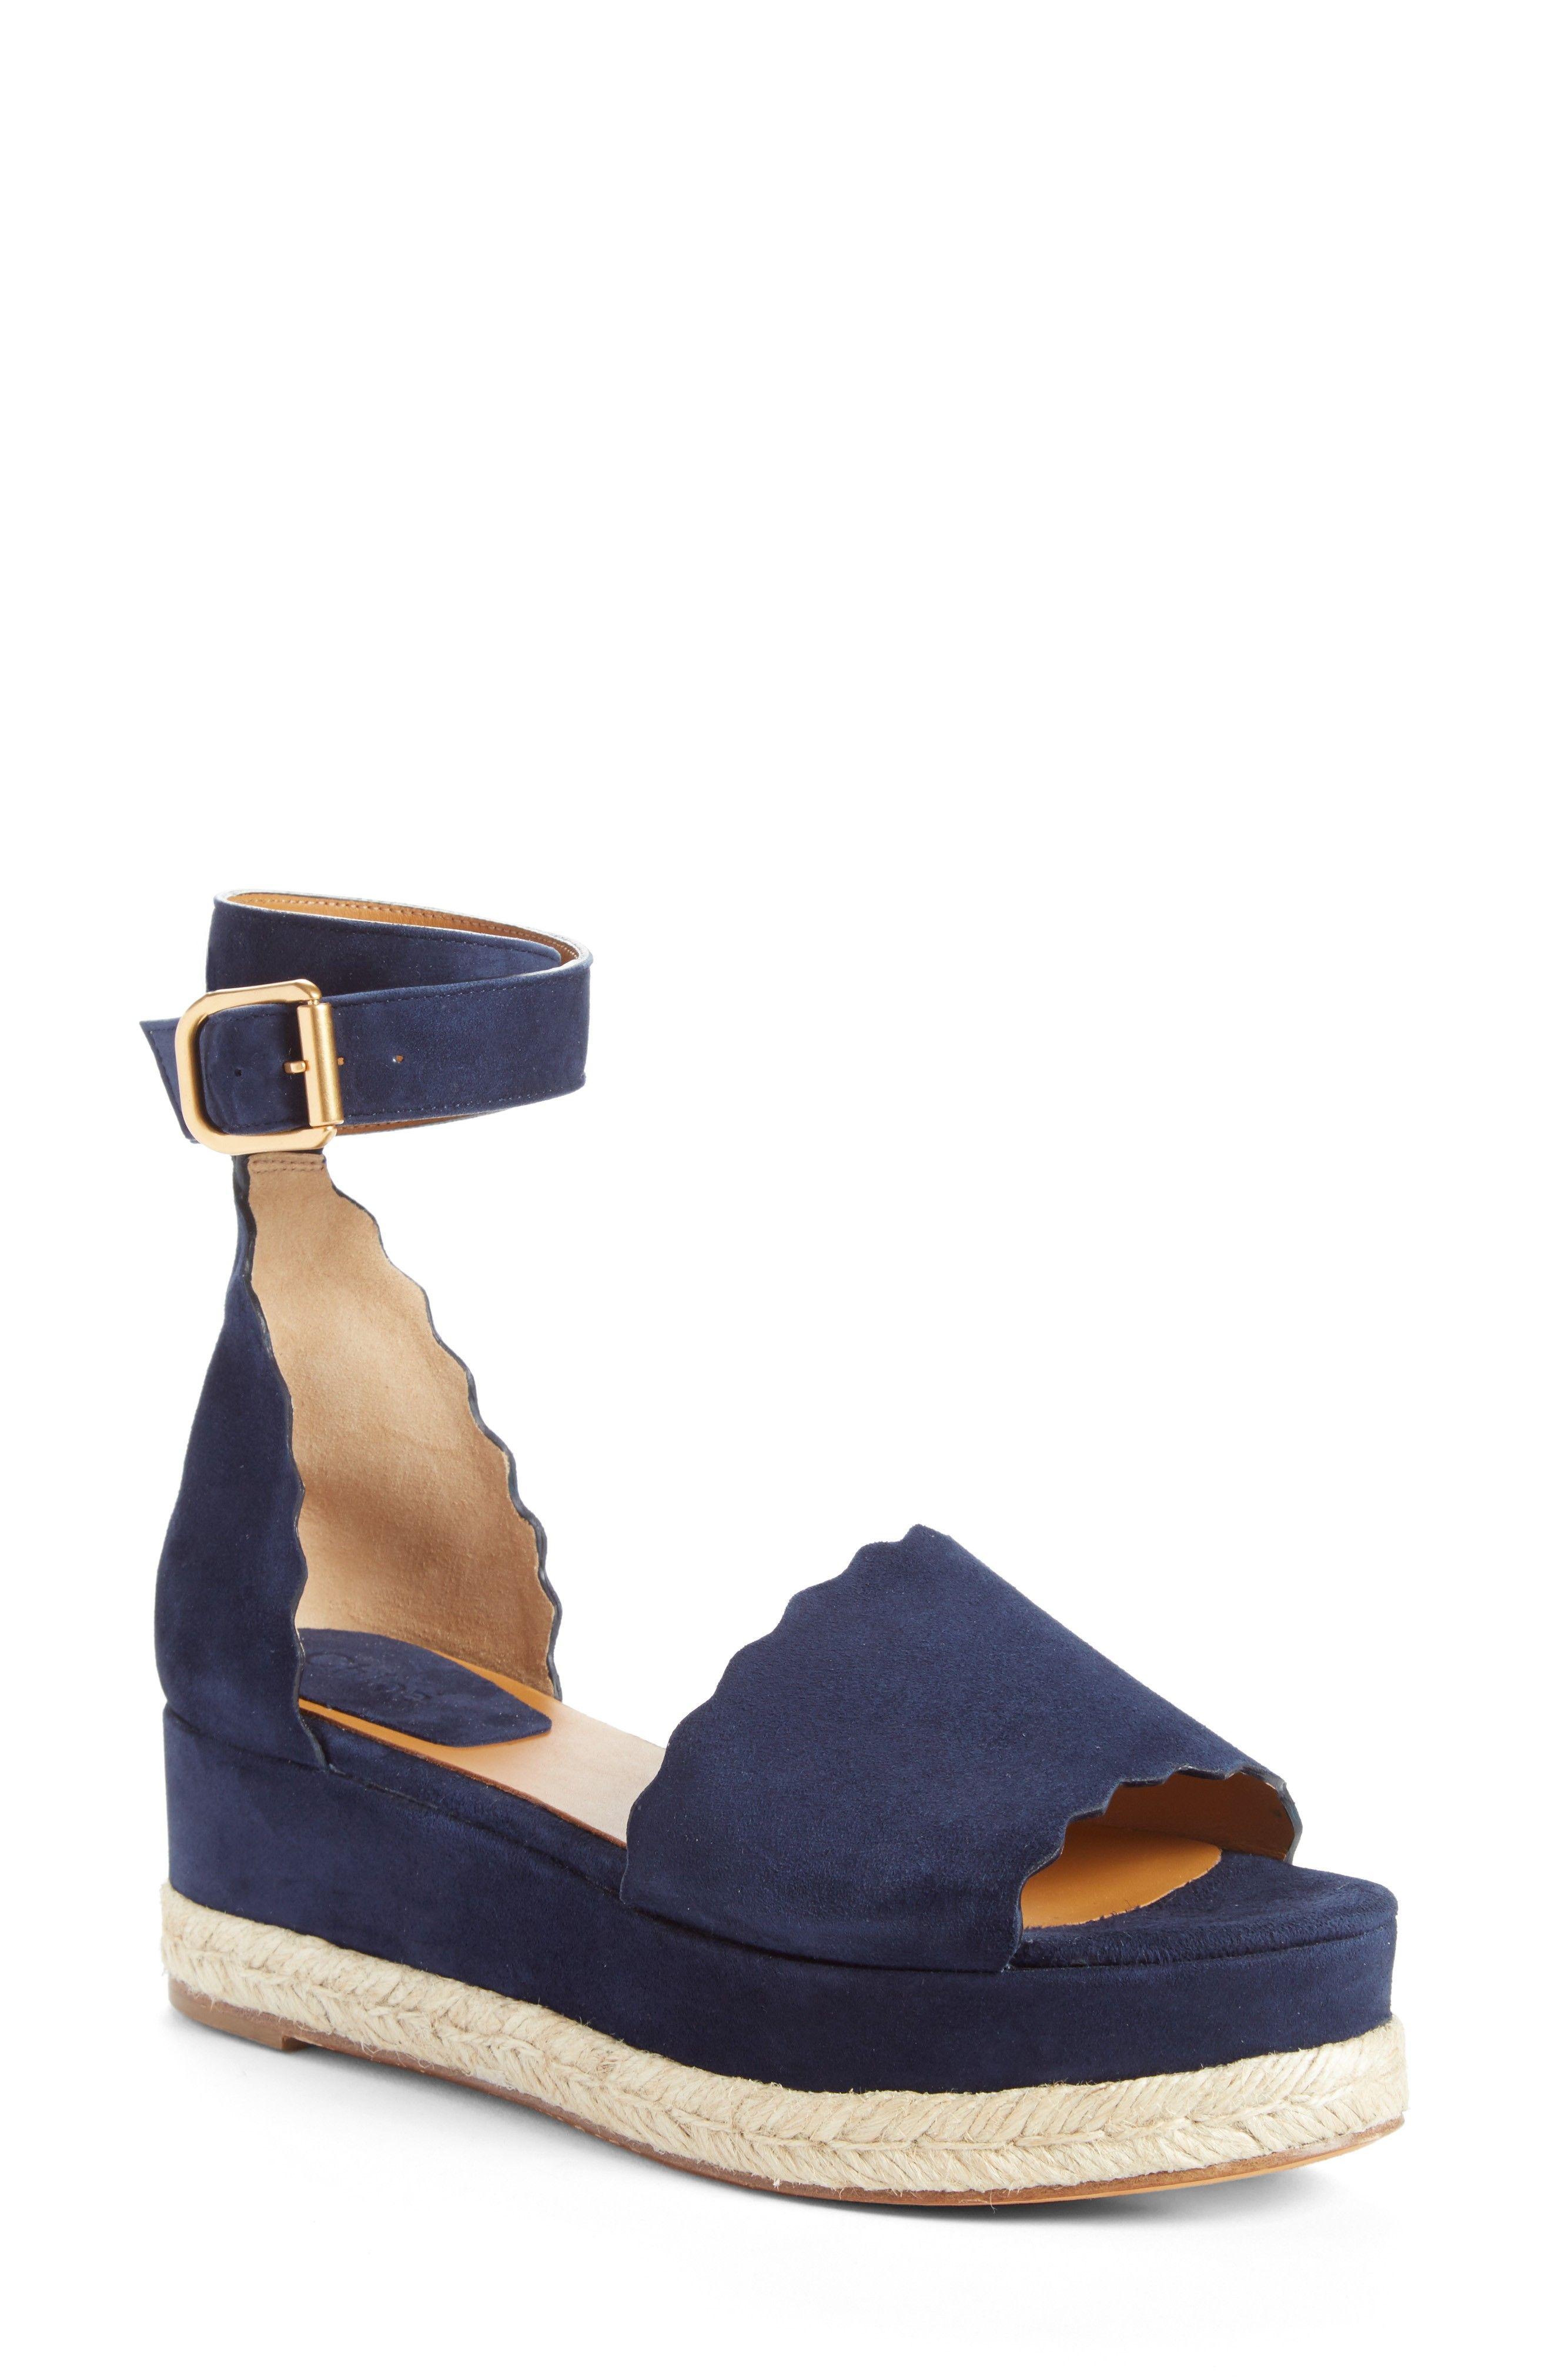 Lauren Espadrille Wedge Sandal Navy Espadrille Wedges